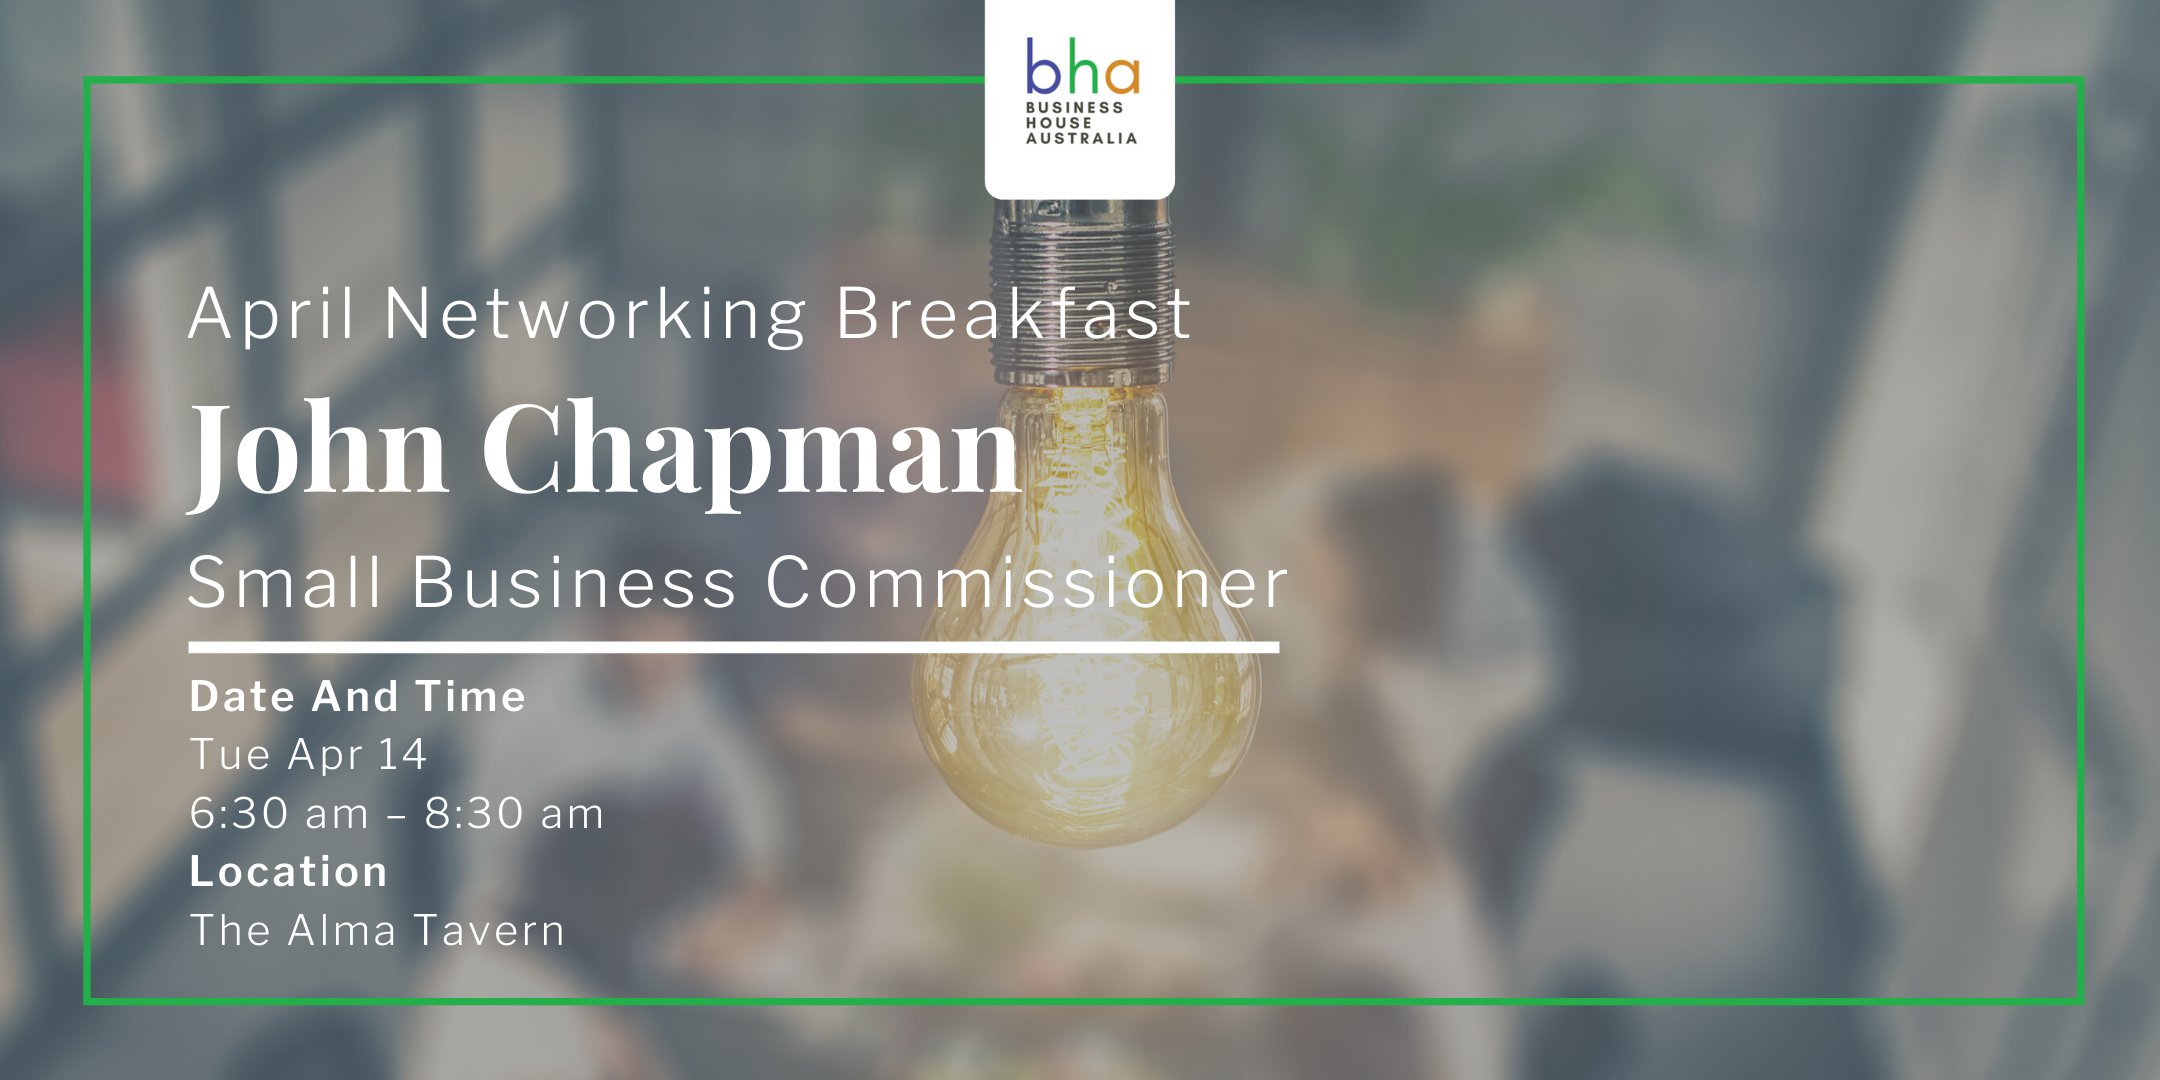 April Networking Breakfast